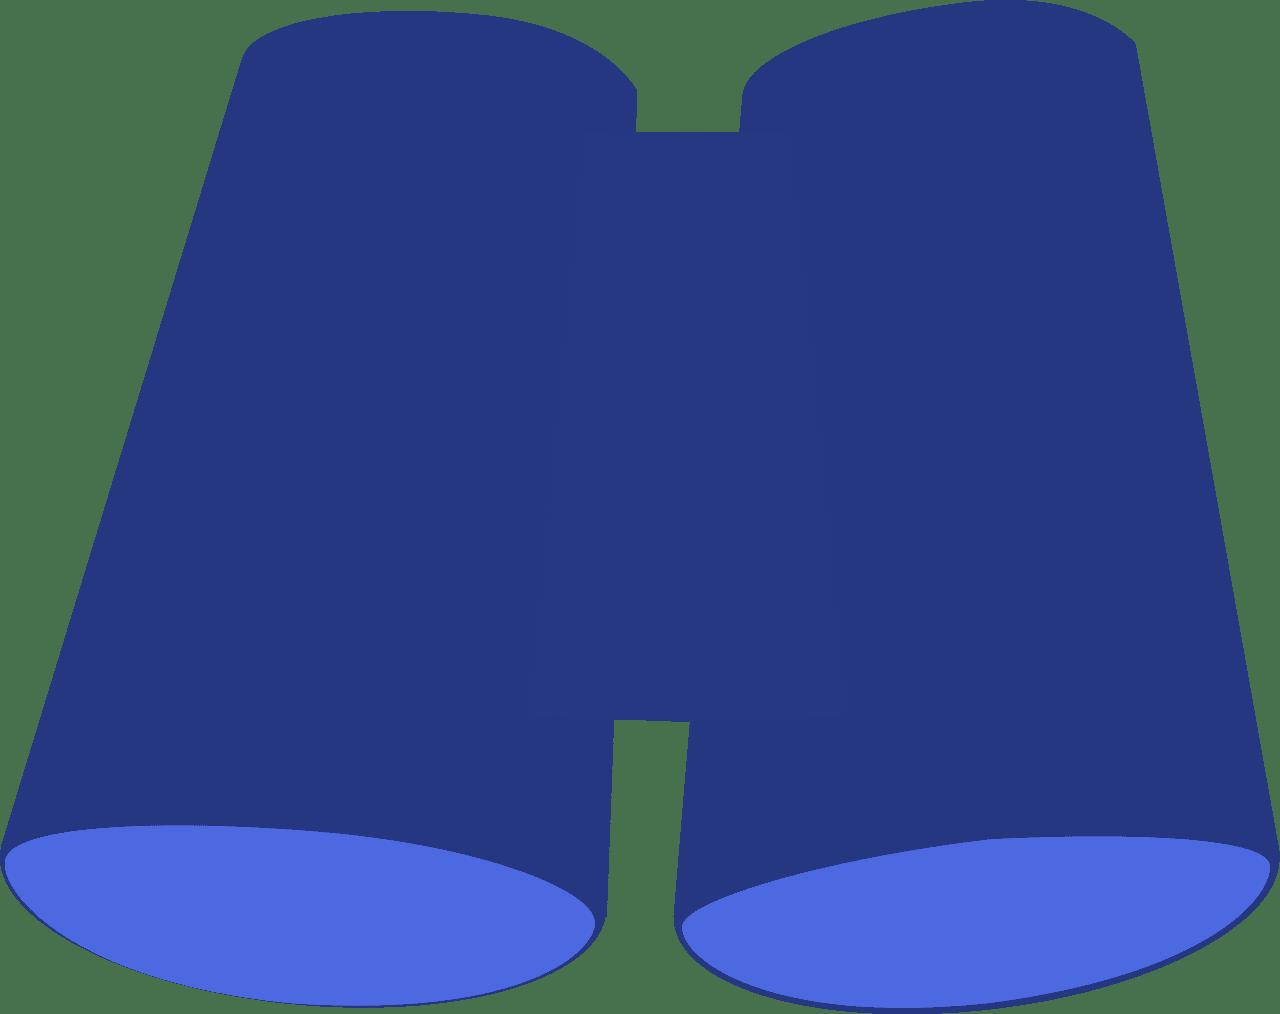 Binoculars clipart transparent 6